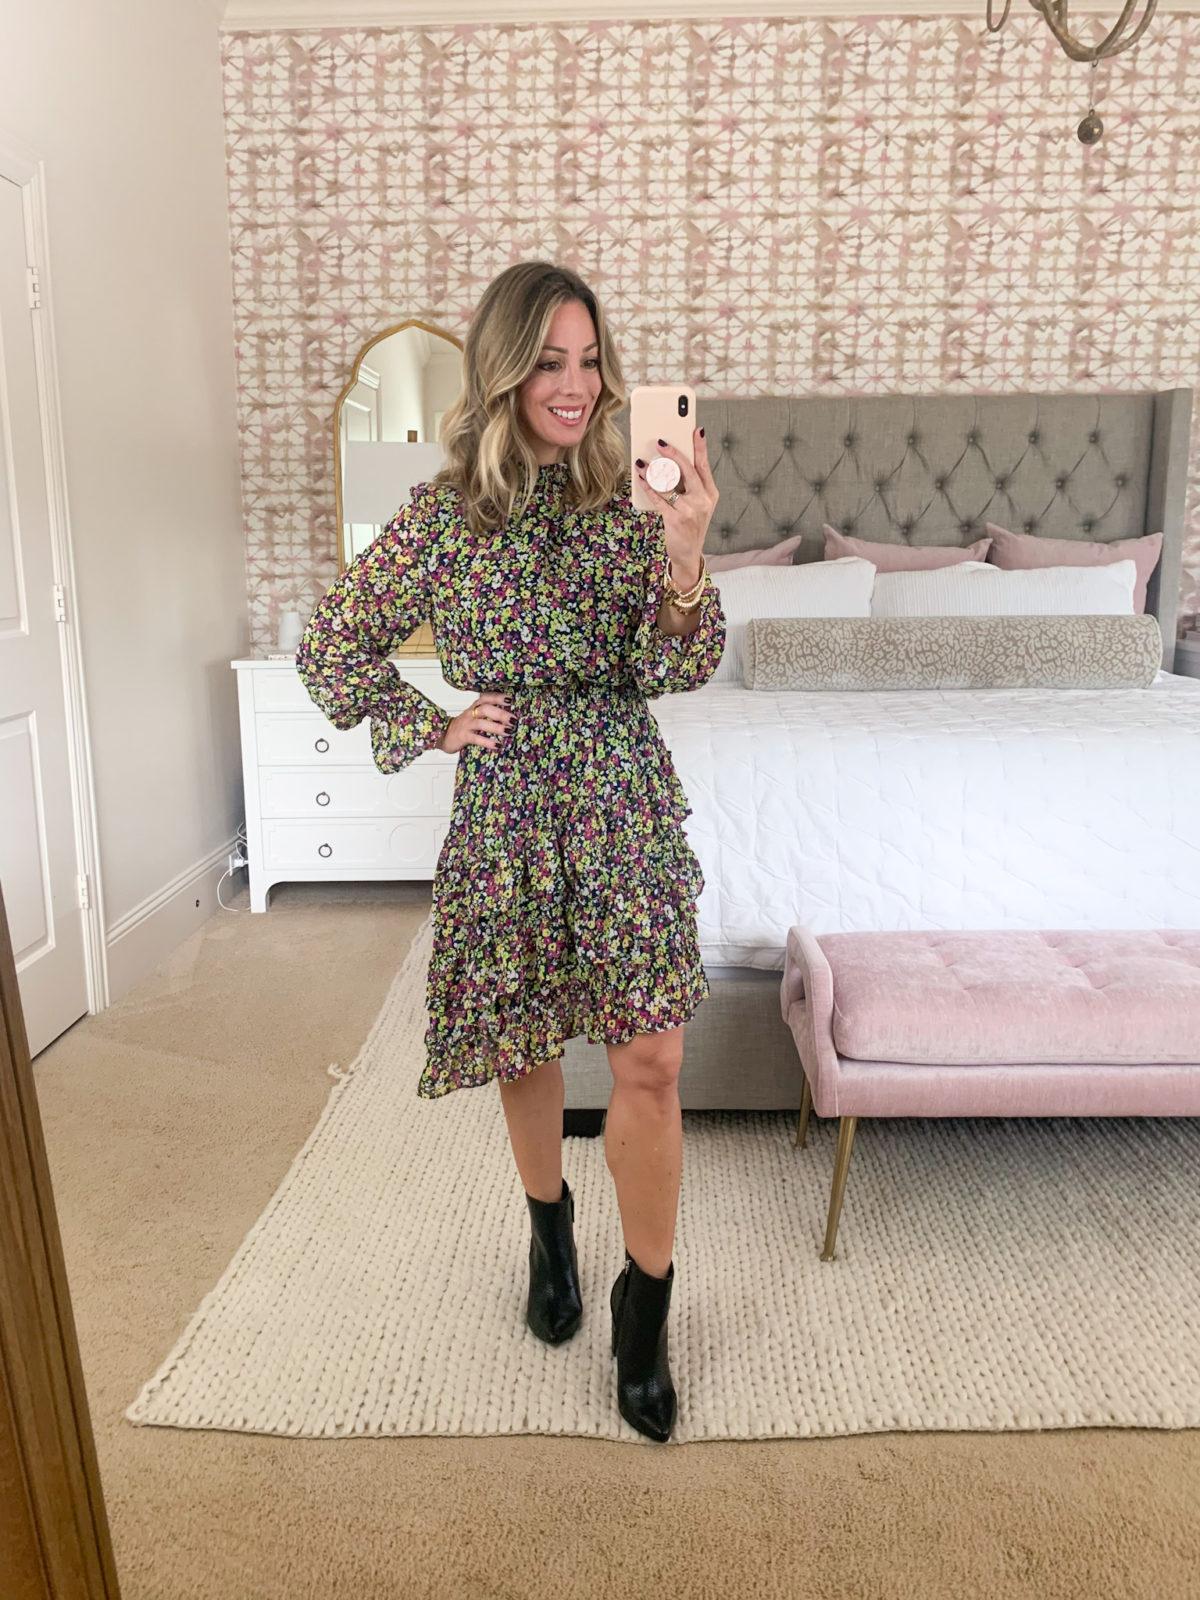 Walmart Fashion, Floral Slant Hemline MIdi Dress, Booties